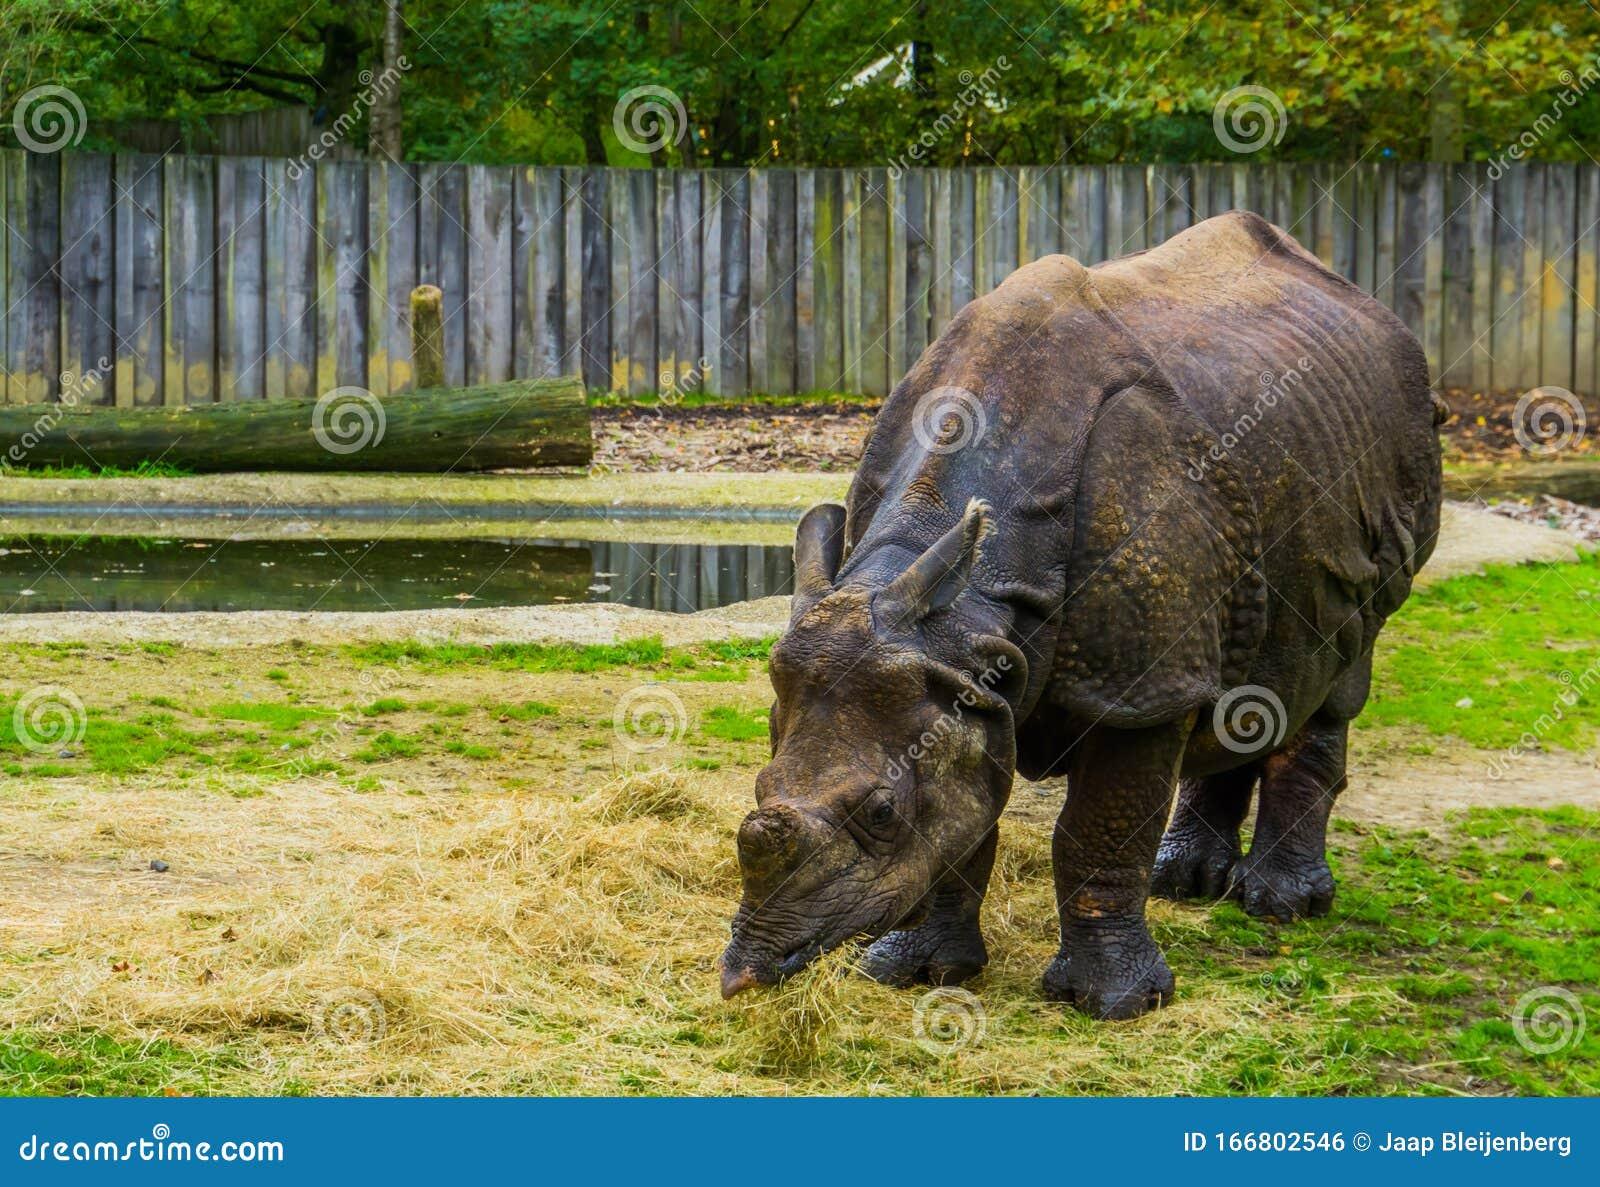 Great Indian Rhinoceros Eating Food, Diet Of A Rhino ...